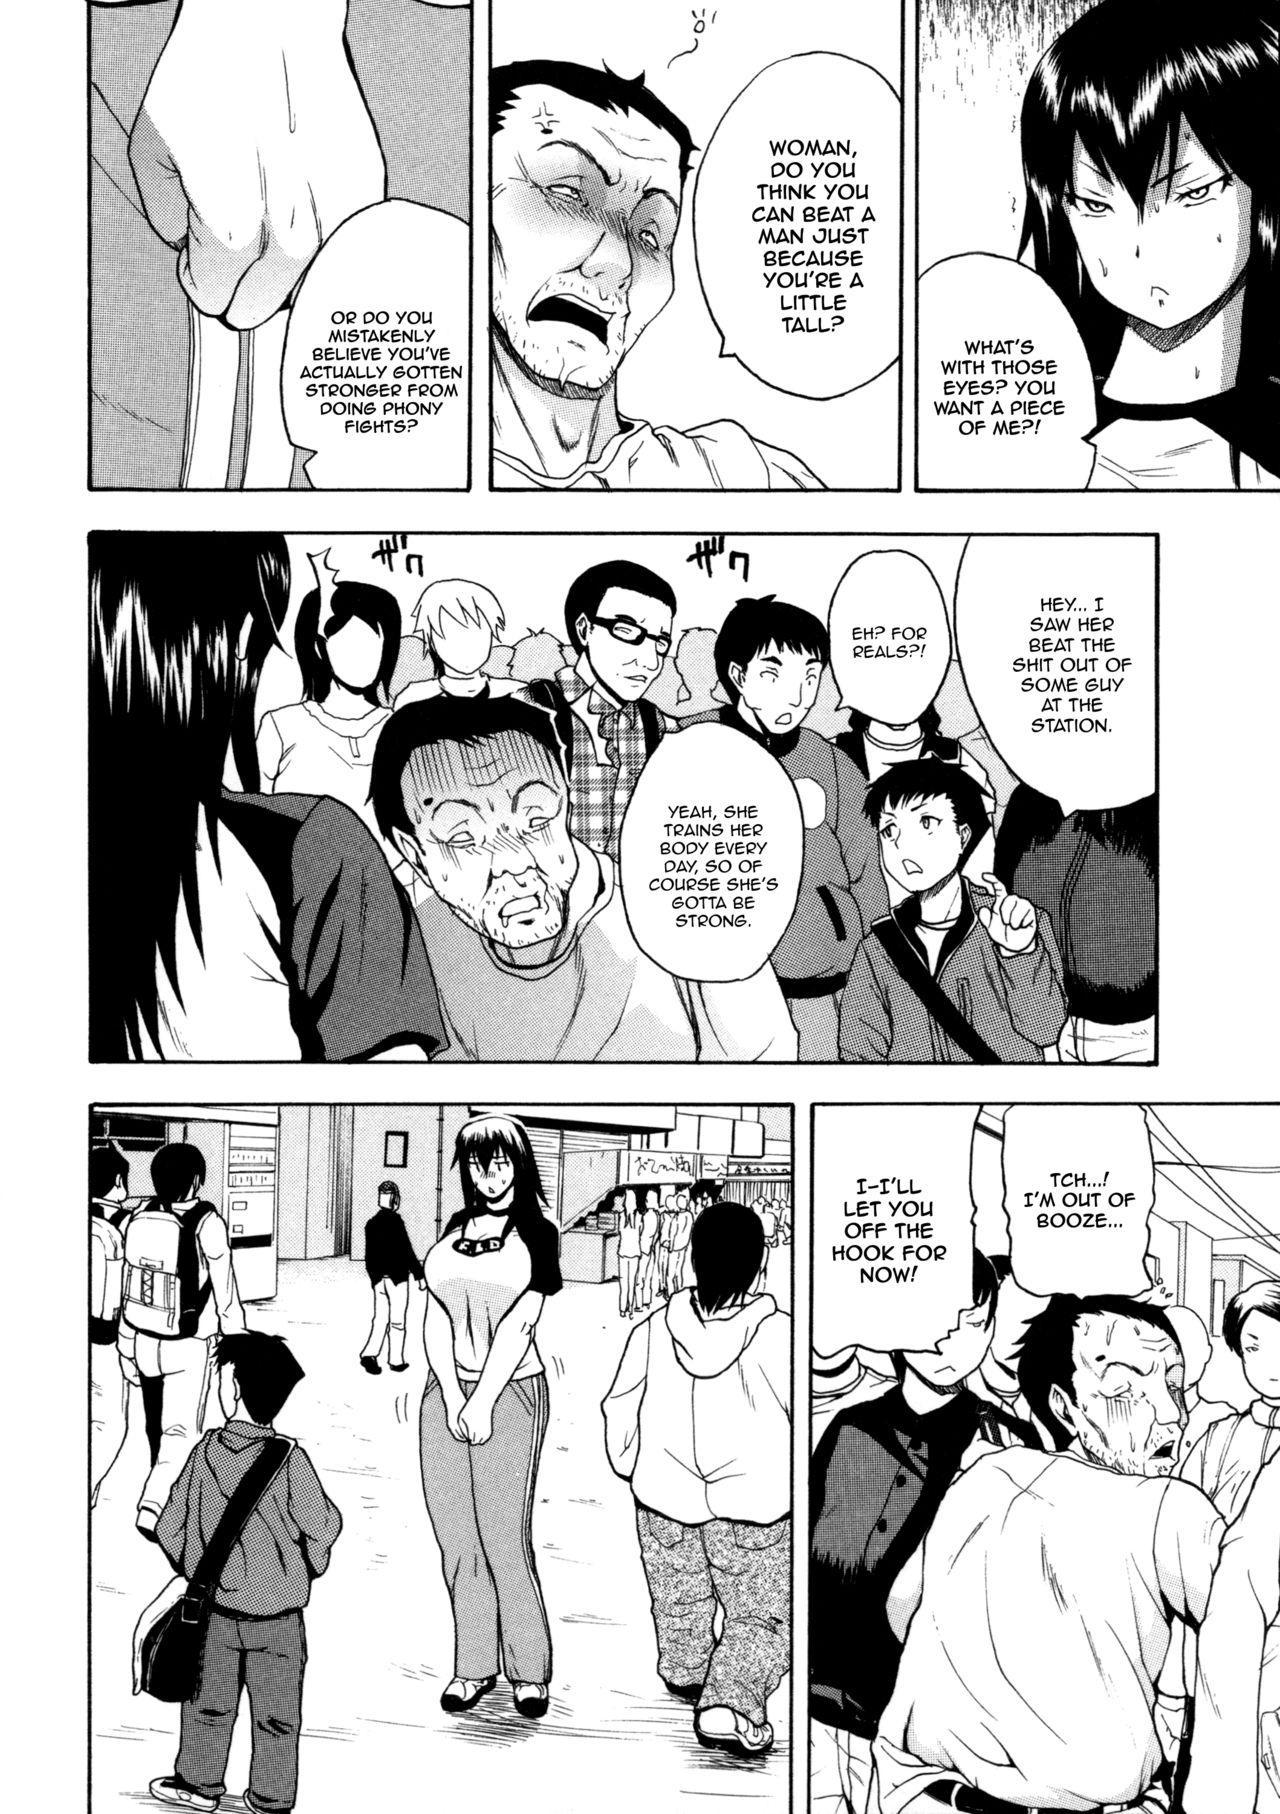 [Yoshimura Tatsumaki] Monzetsu Taigatame ~Count 3 de Ikasete Ageru~ | Faint in Agony Bodylock ~I'll make you cum on the count of 3~ [English] [Brolen] 152